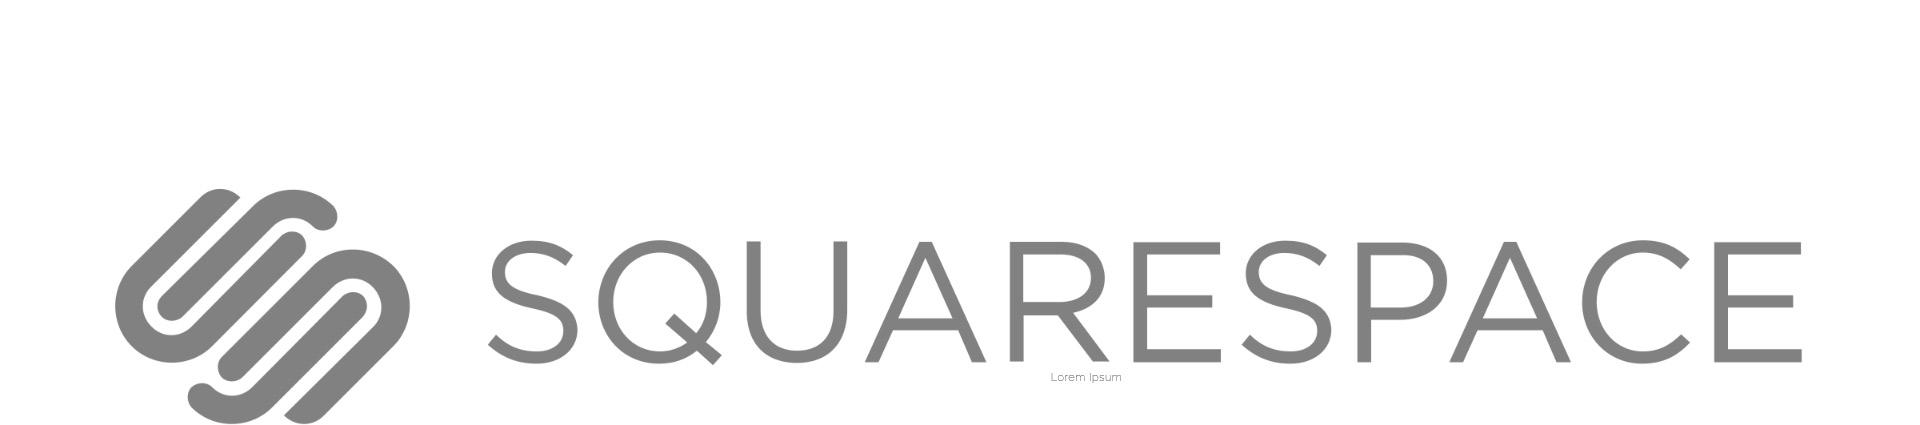 greysquarespace.jpg